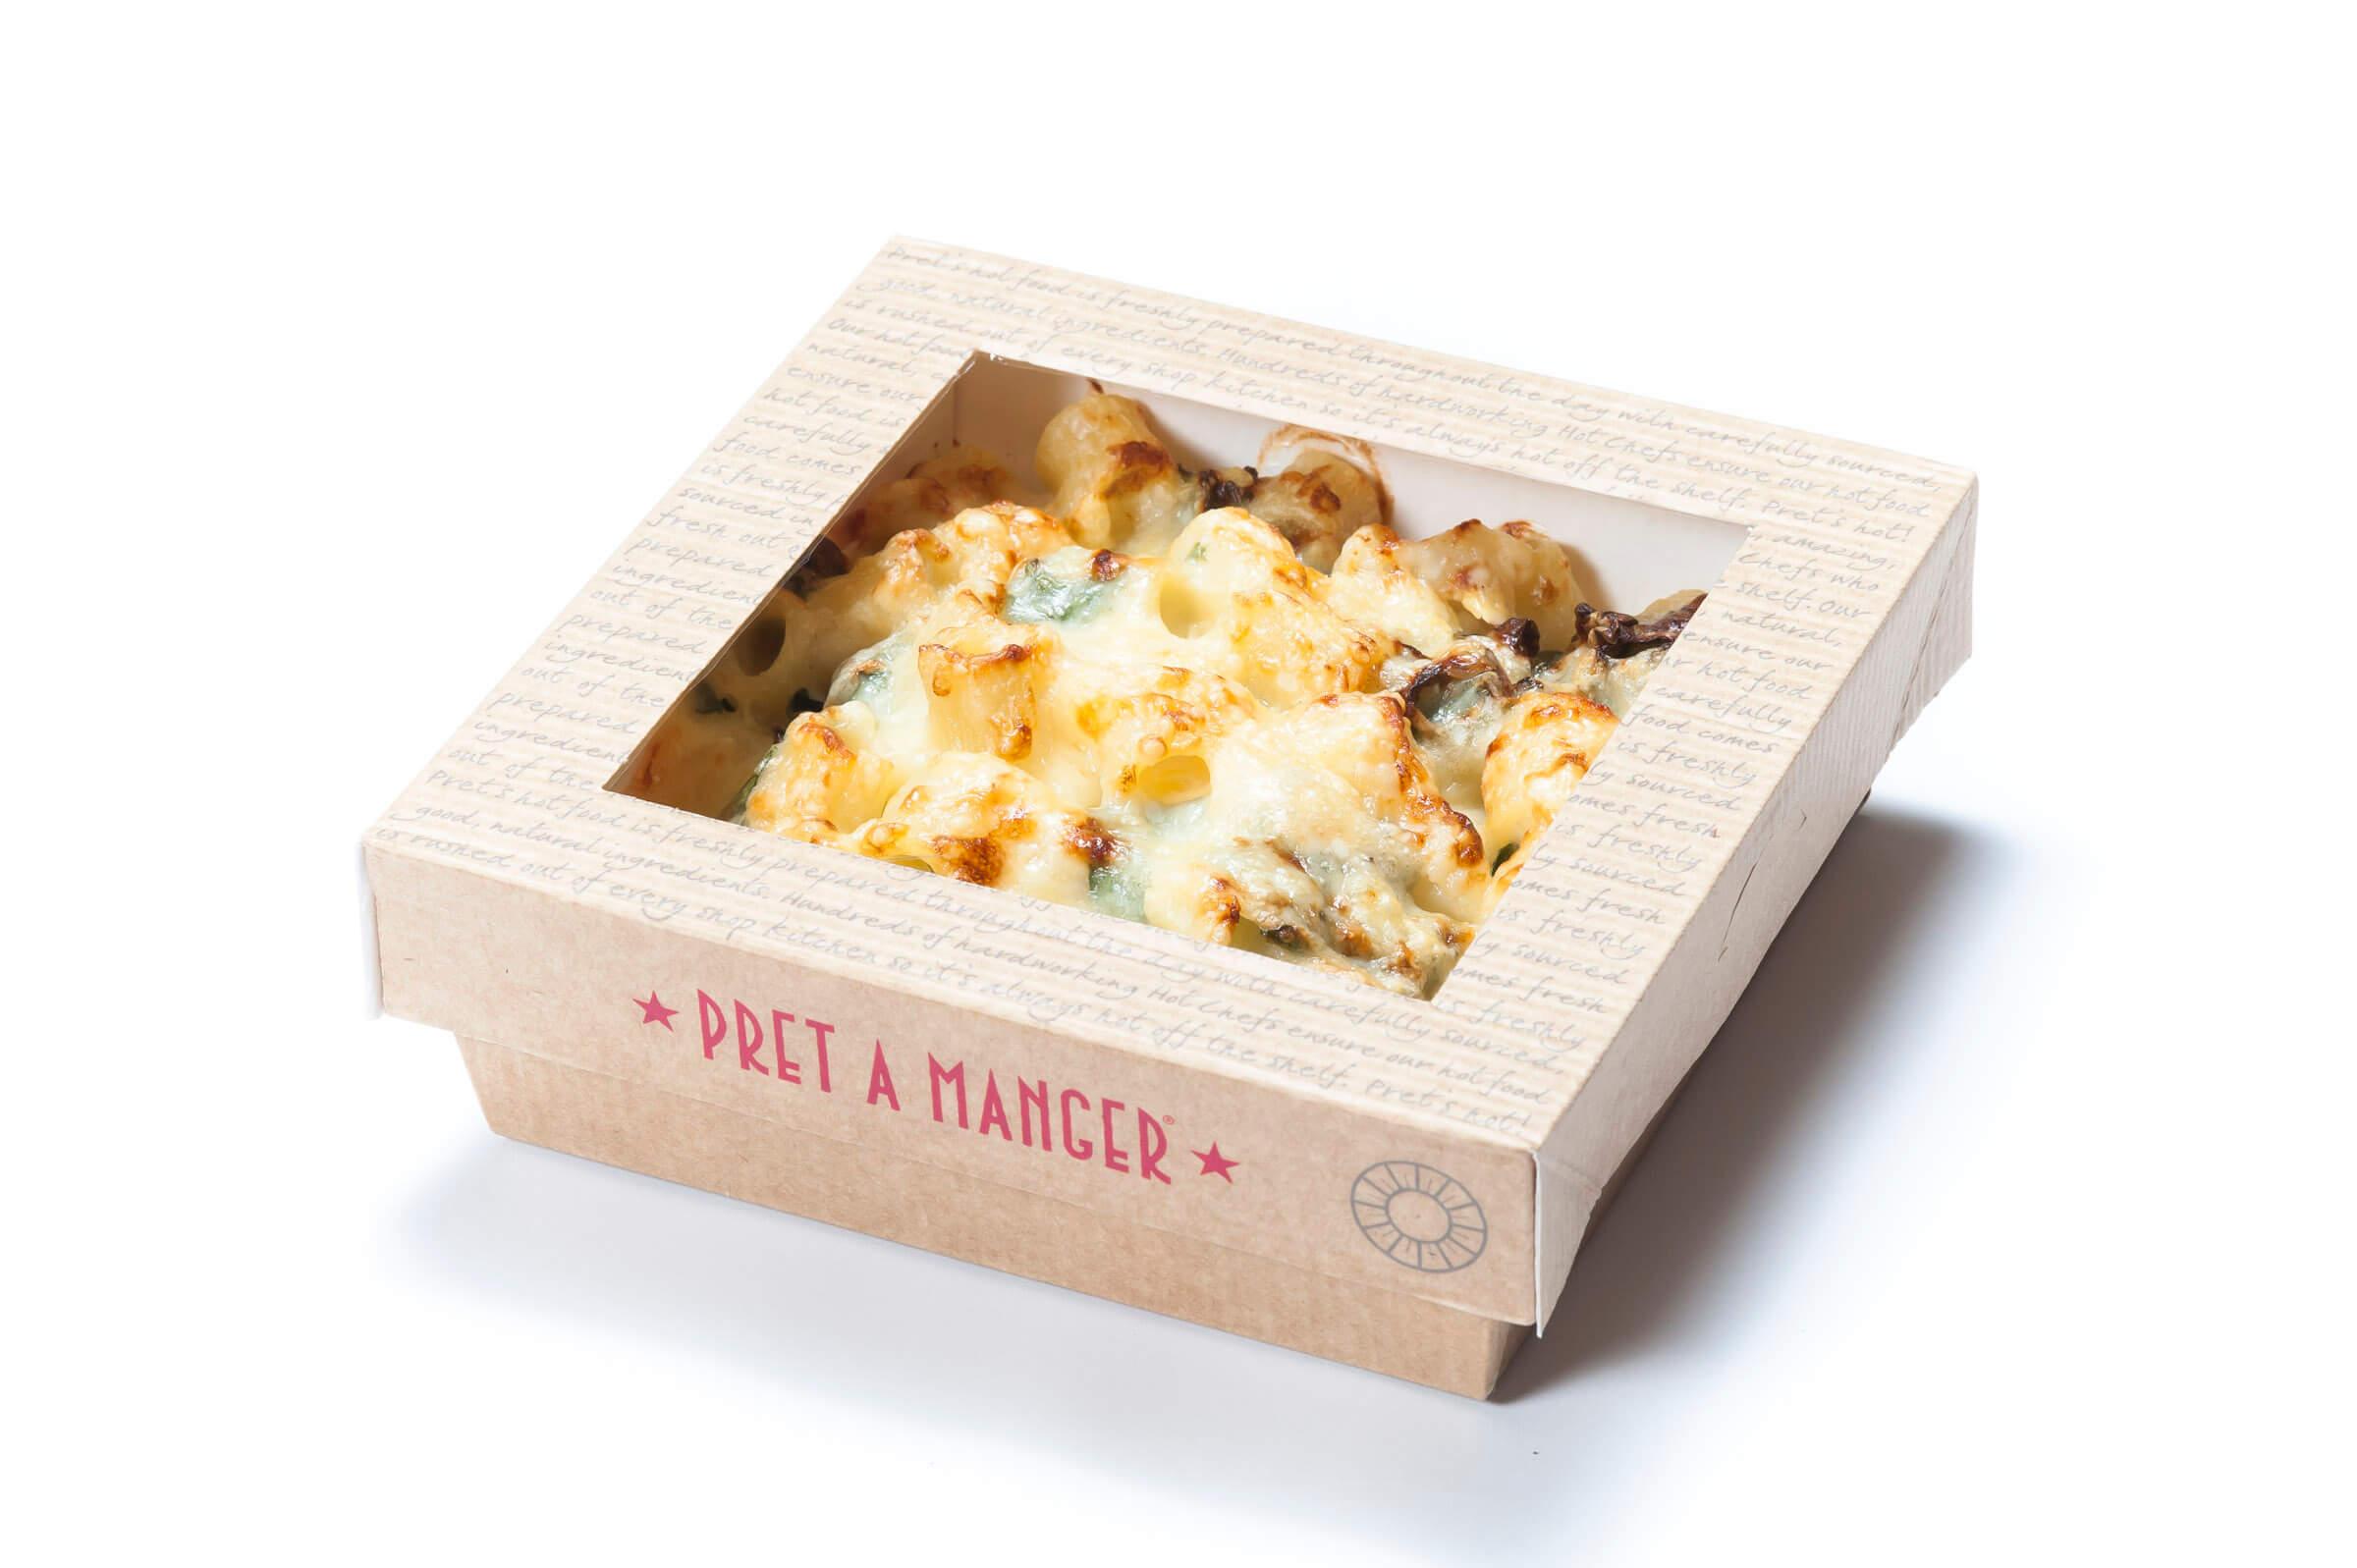 mac and cheese london, Mac n' Cheese in London, italian restaurants london, food london